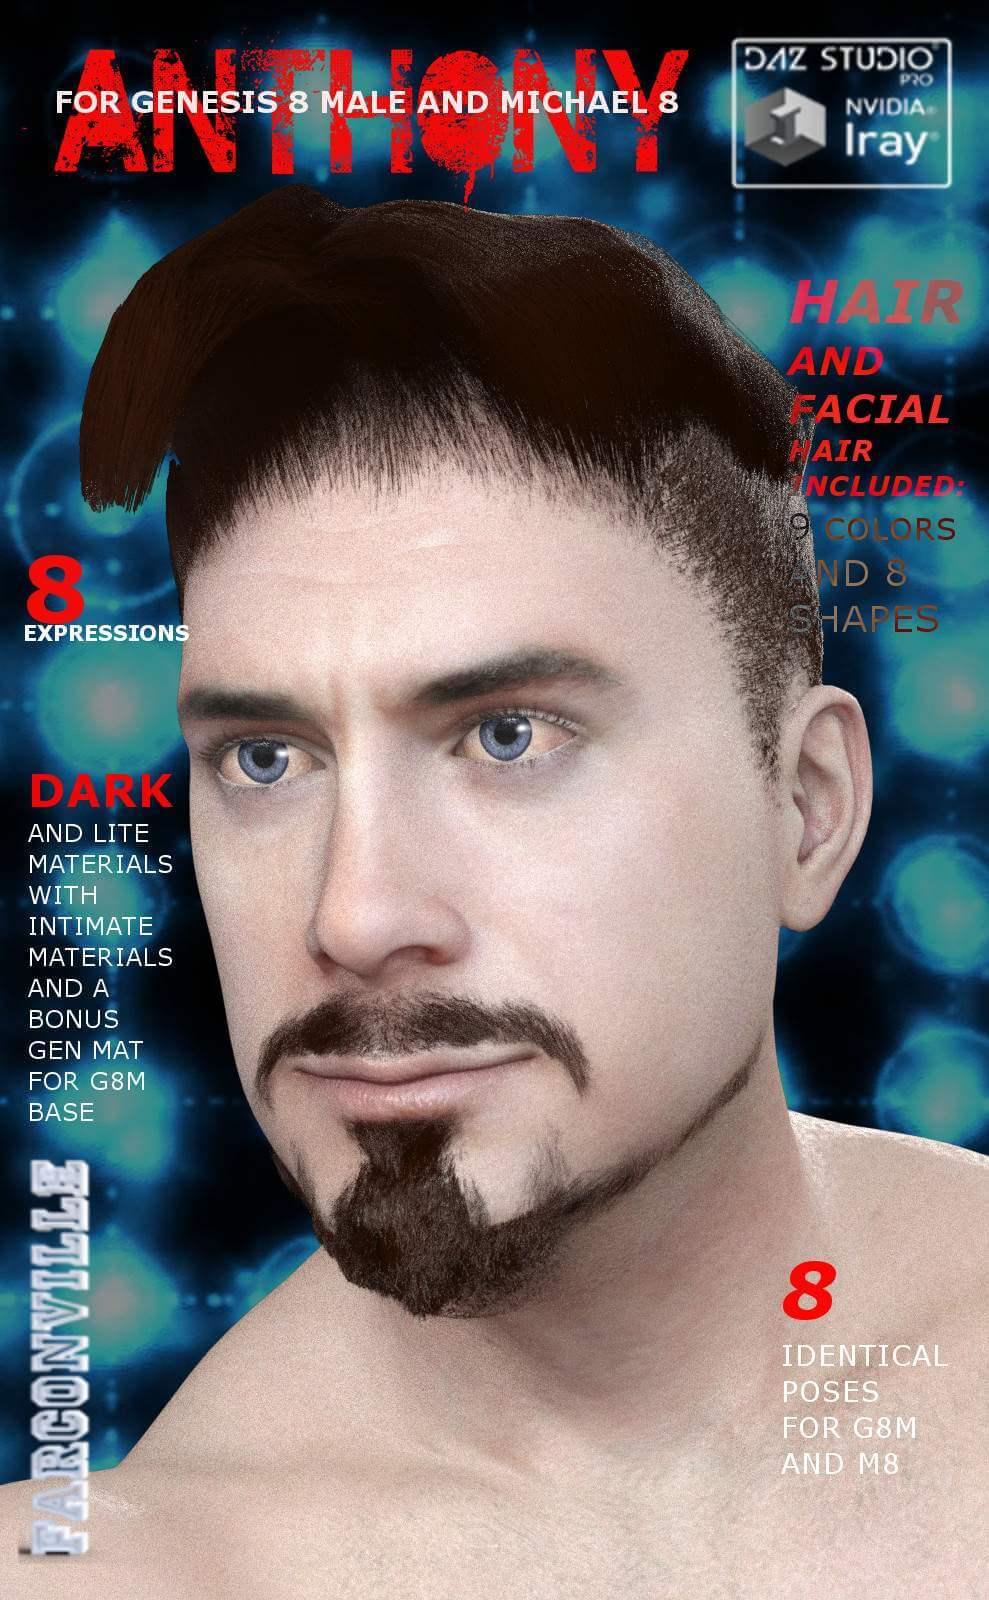 dazs genesis 2 male genital figure